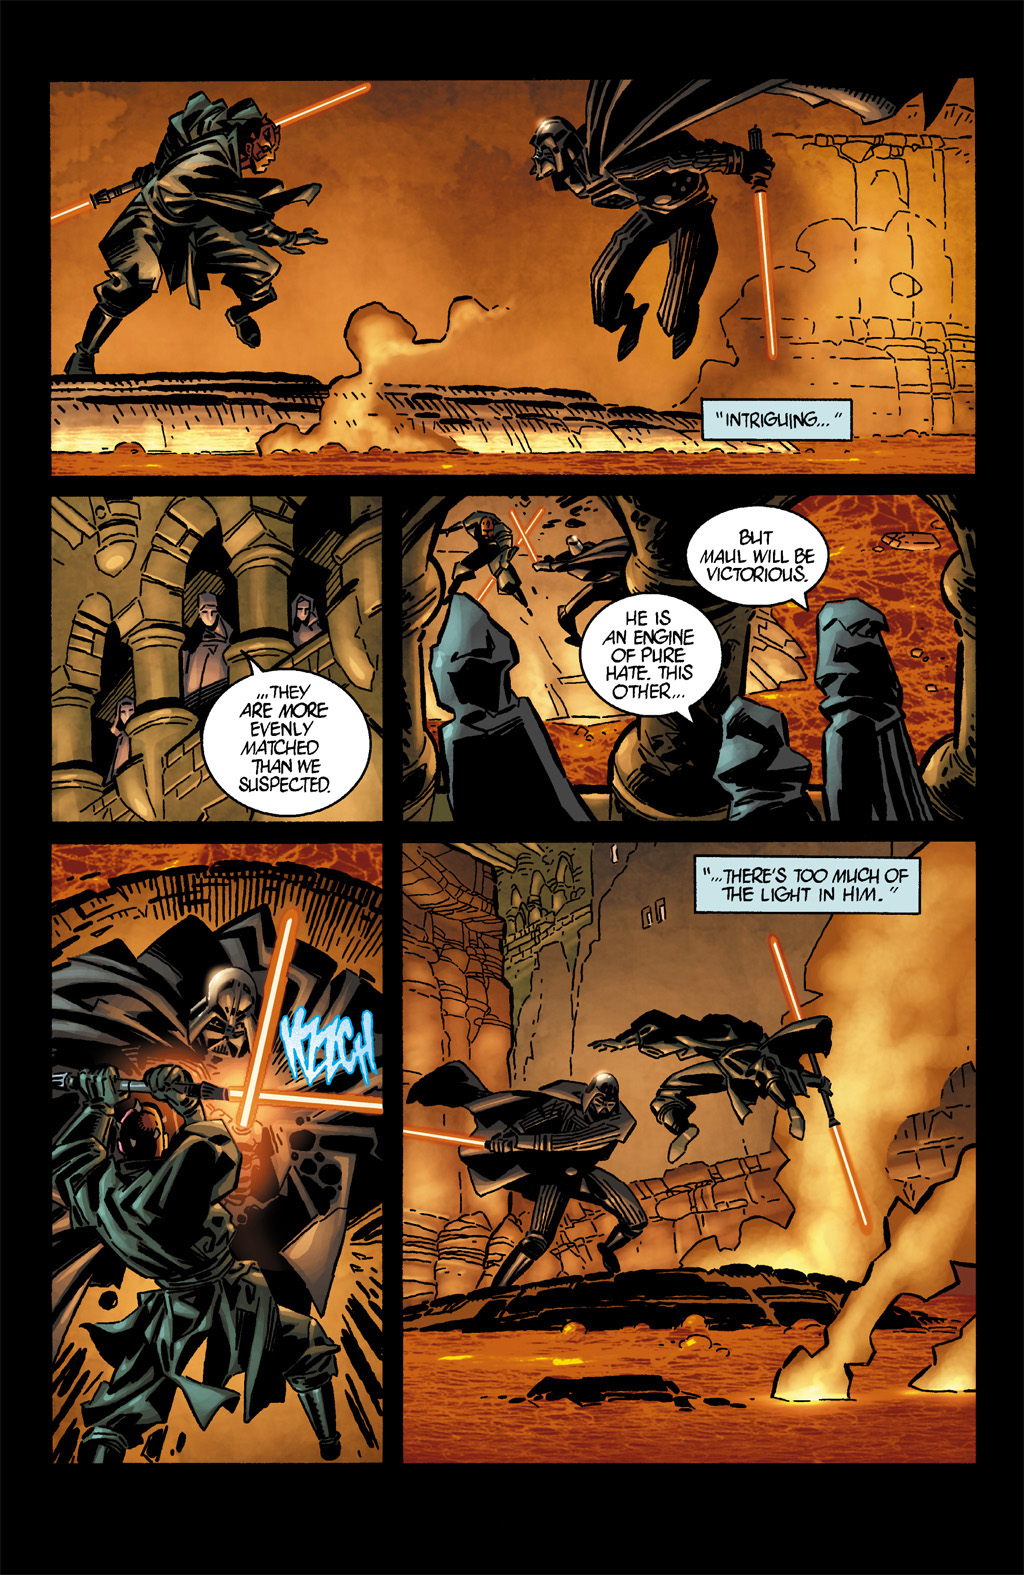 ANH Vader vs TPM Kenobi  - Page 6 Rco03413